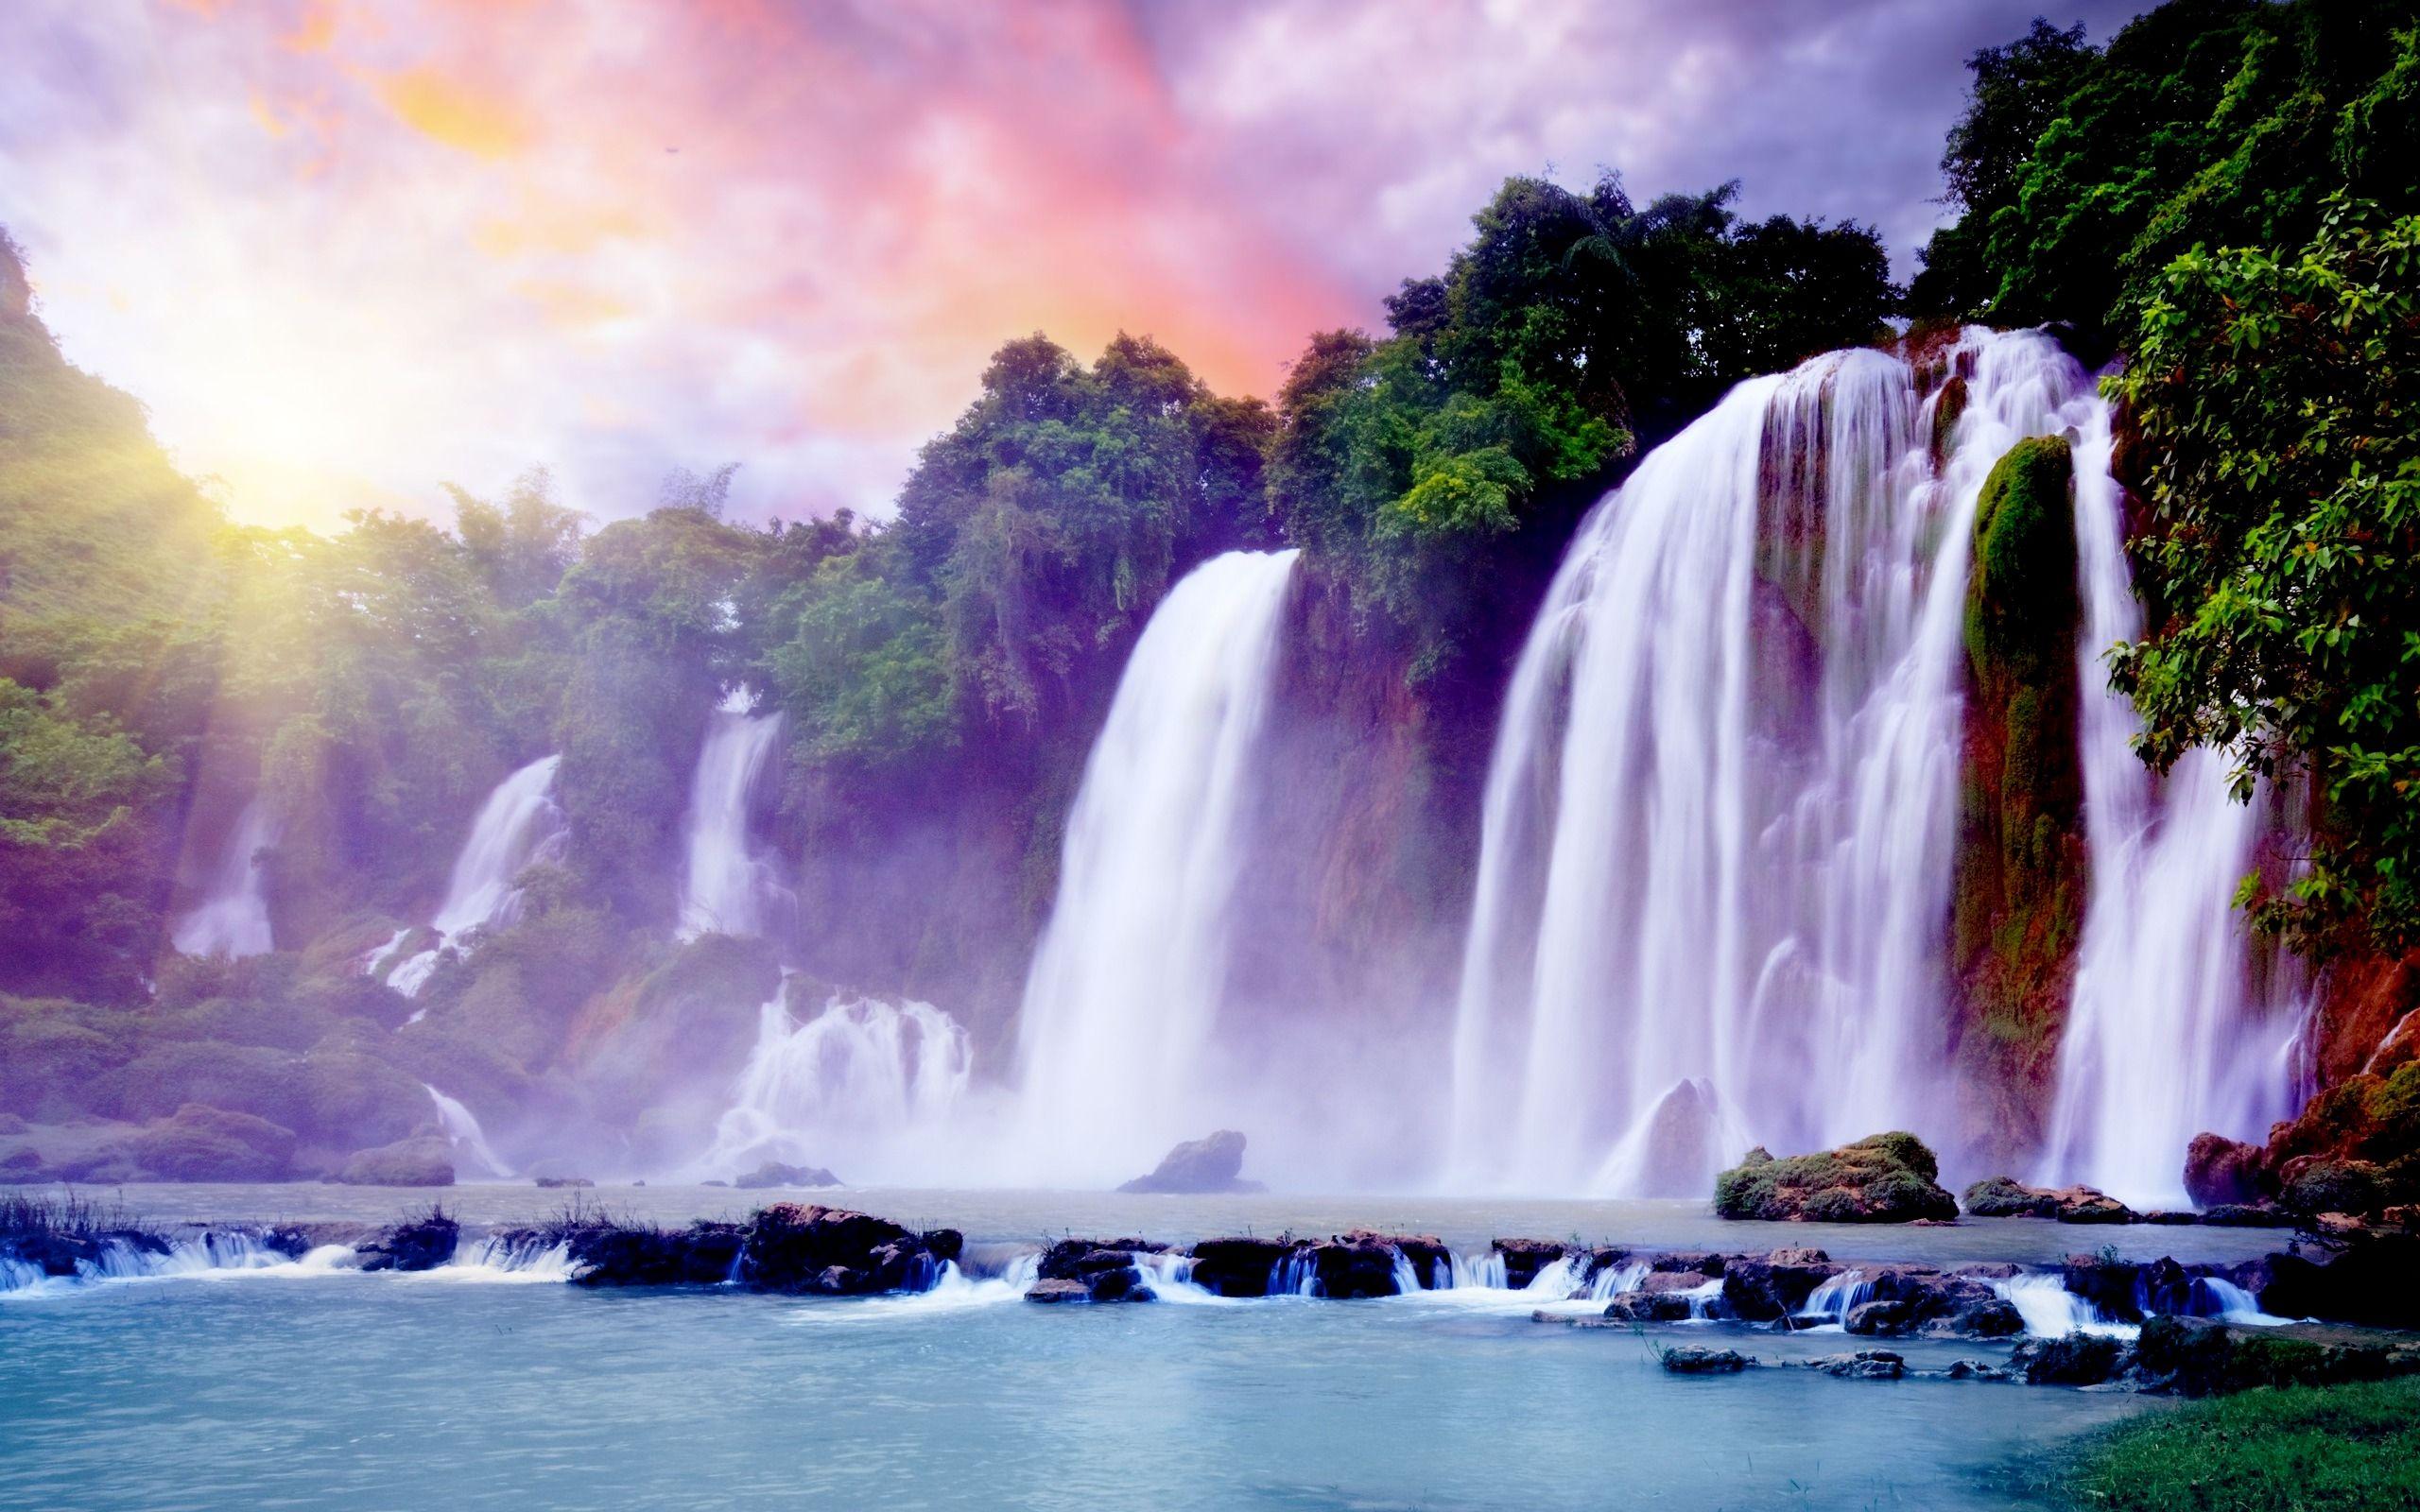 Free Waterfalls Wallpaper Paradise Falls Wallpapers Hd Wallpapers 93517 Waterfall Wallpaper Scenery Waterfall